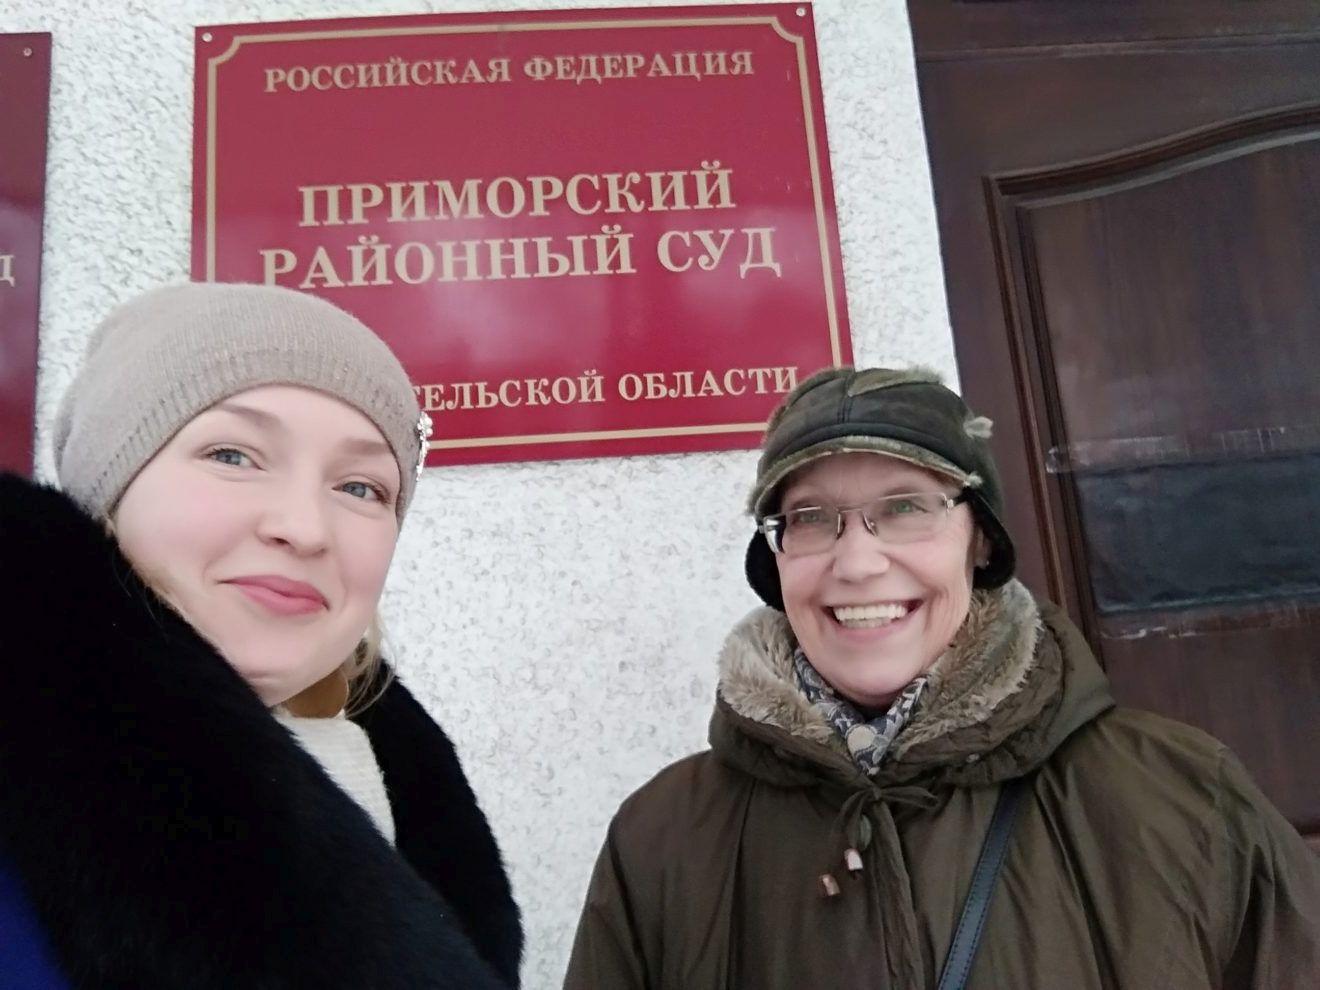 Bochkareva wins case